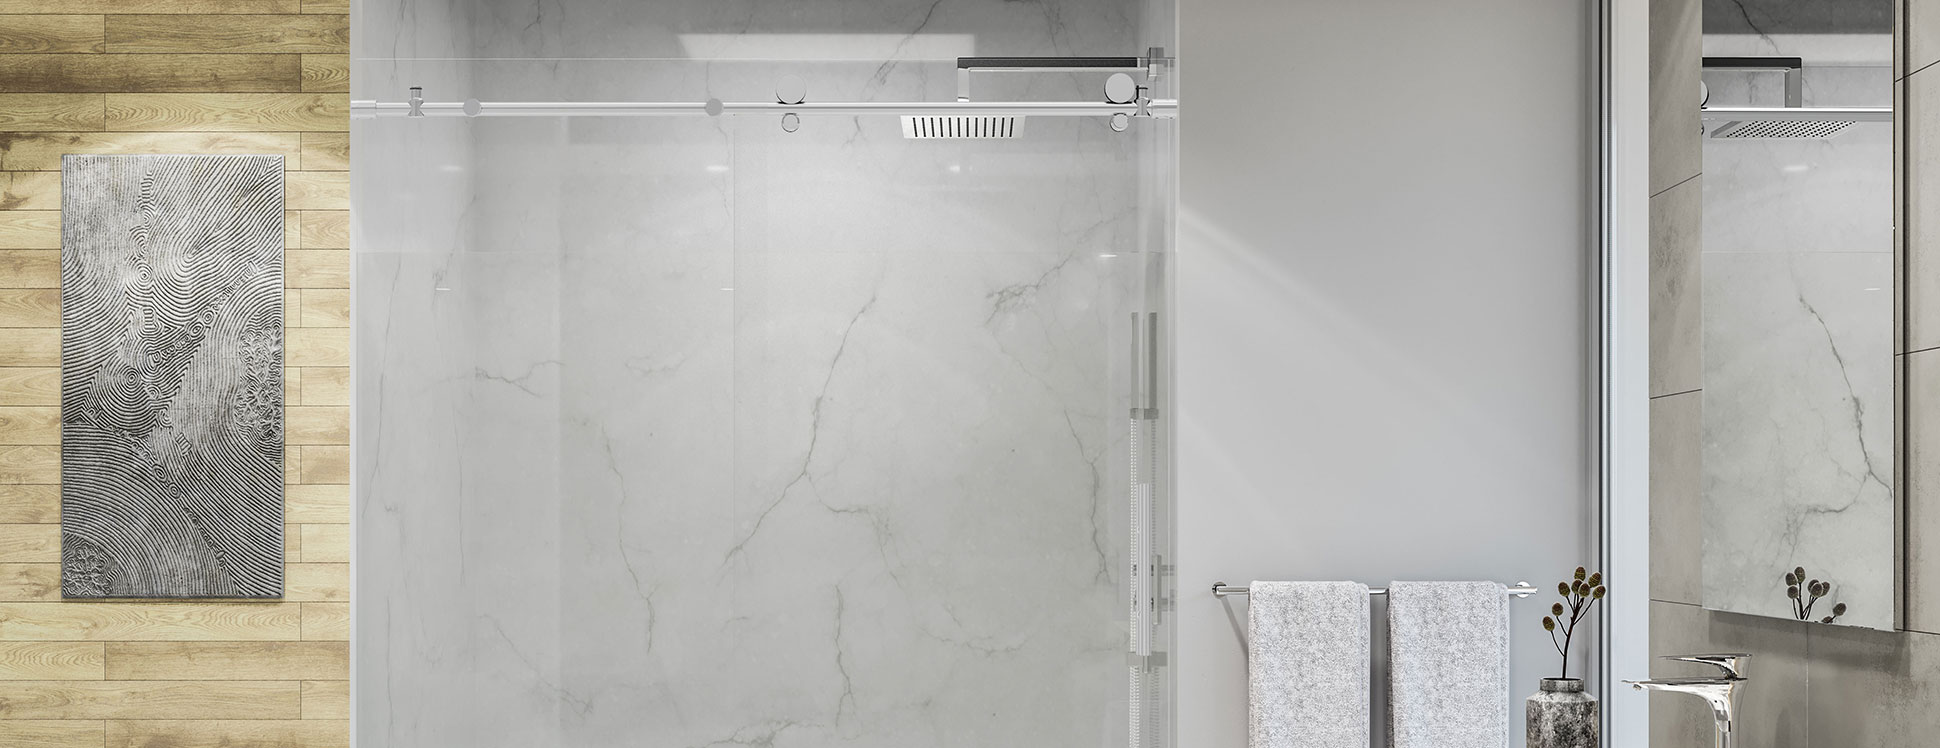 Agalite Shower Bath Enclosures Wp Engine The Focal